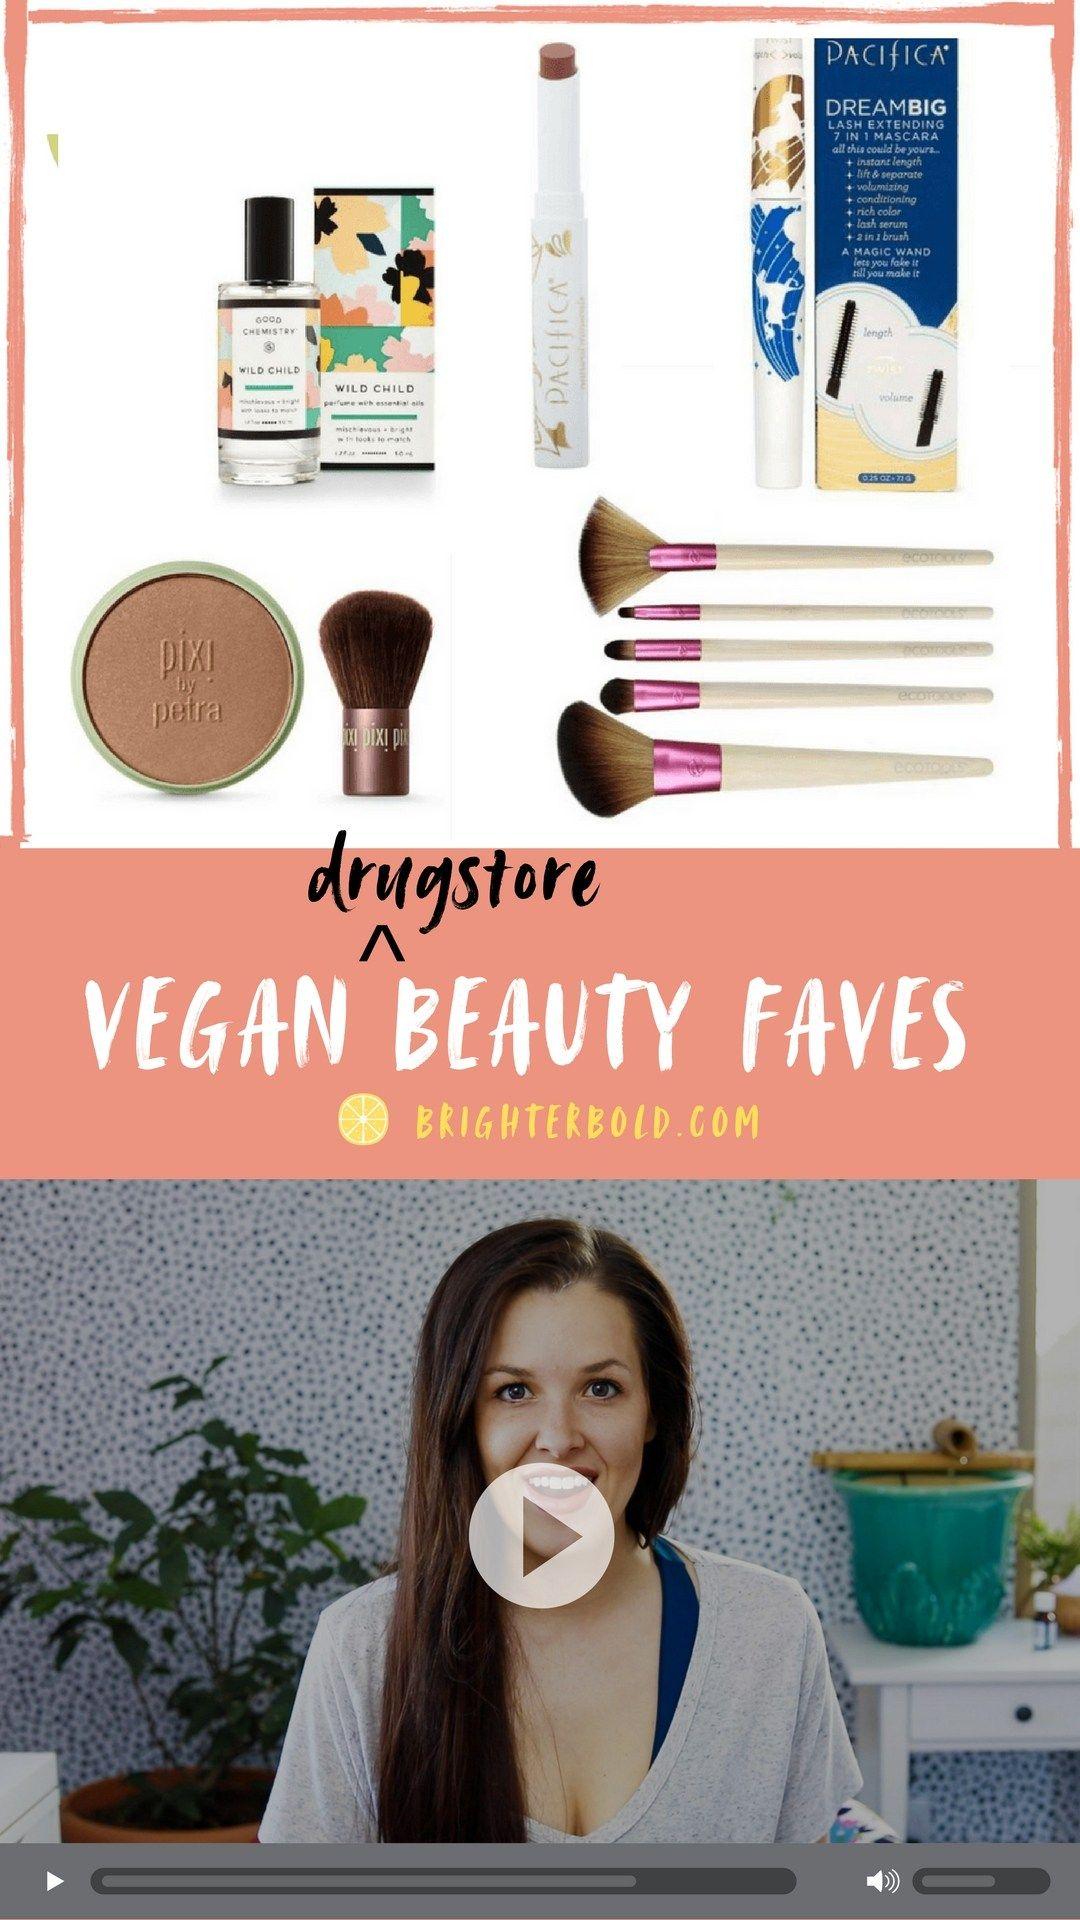 Drugstore Vegan Beauty Faves 🎥 Vegan beauty, Cruelty